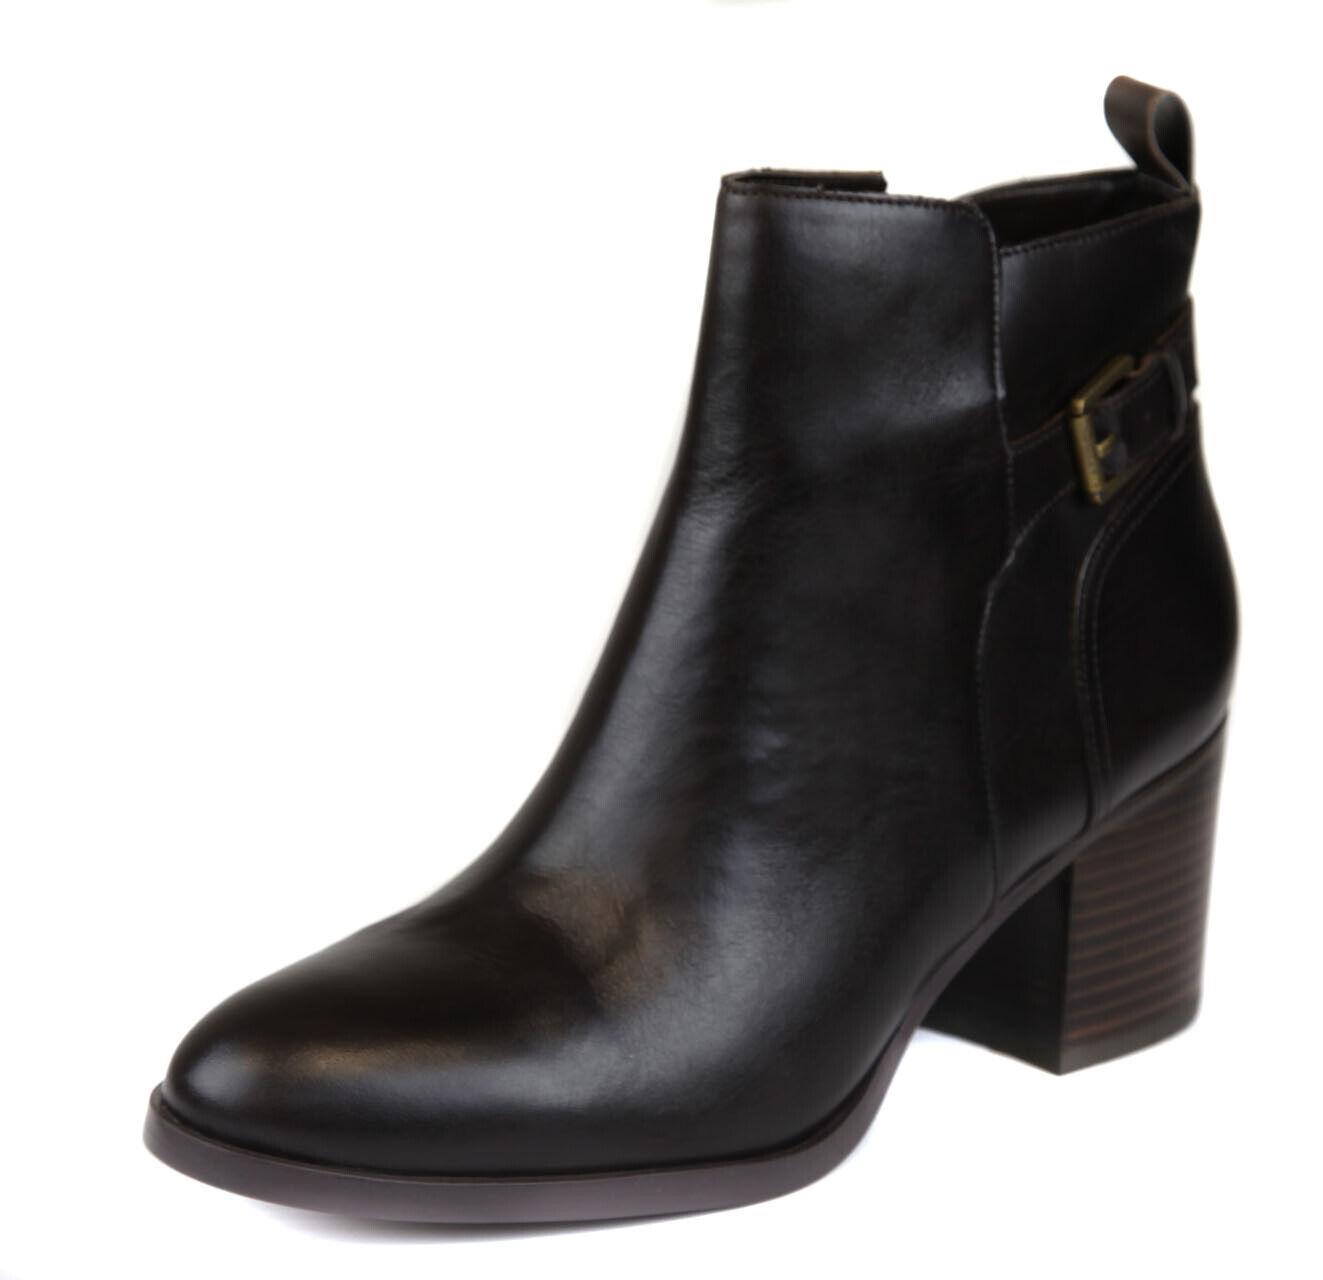 Lauren Ralph Lauren Wouomo Marronee Genna Leather Ankle avvioie scarpe Ret  149 New